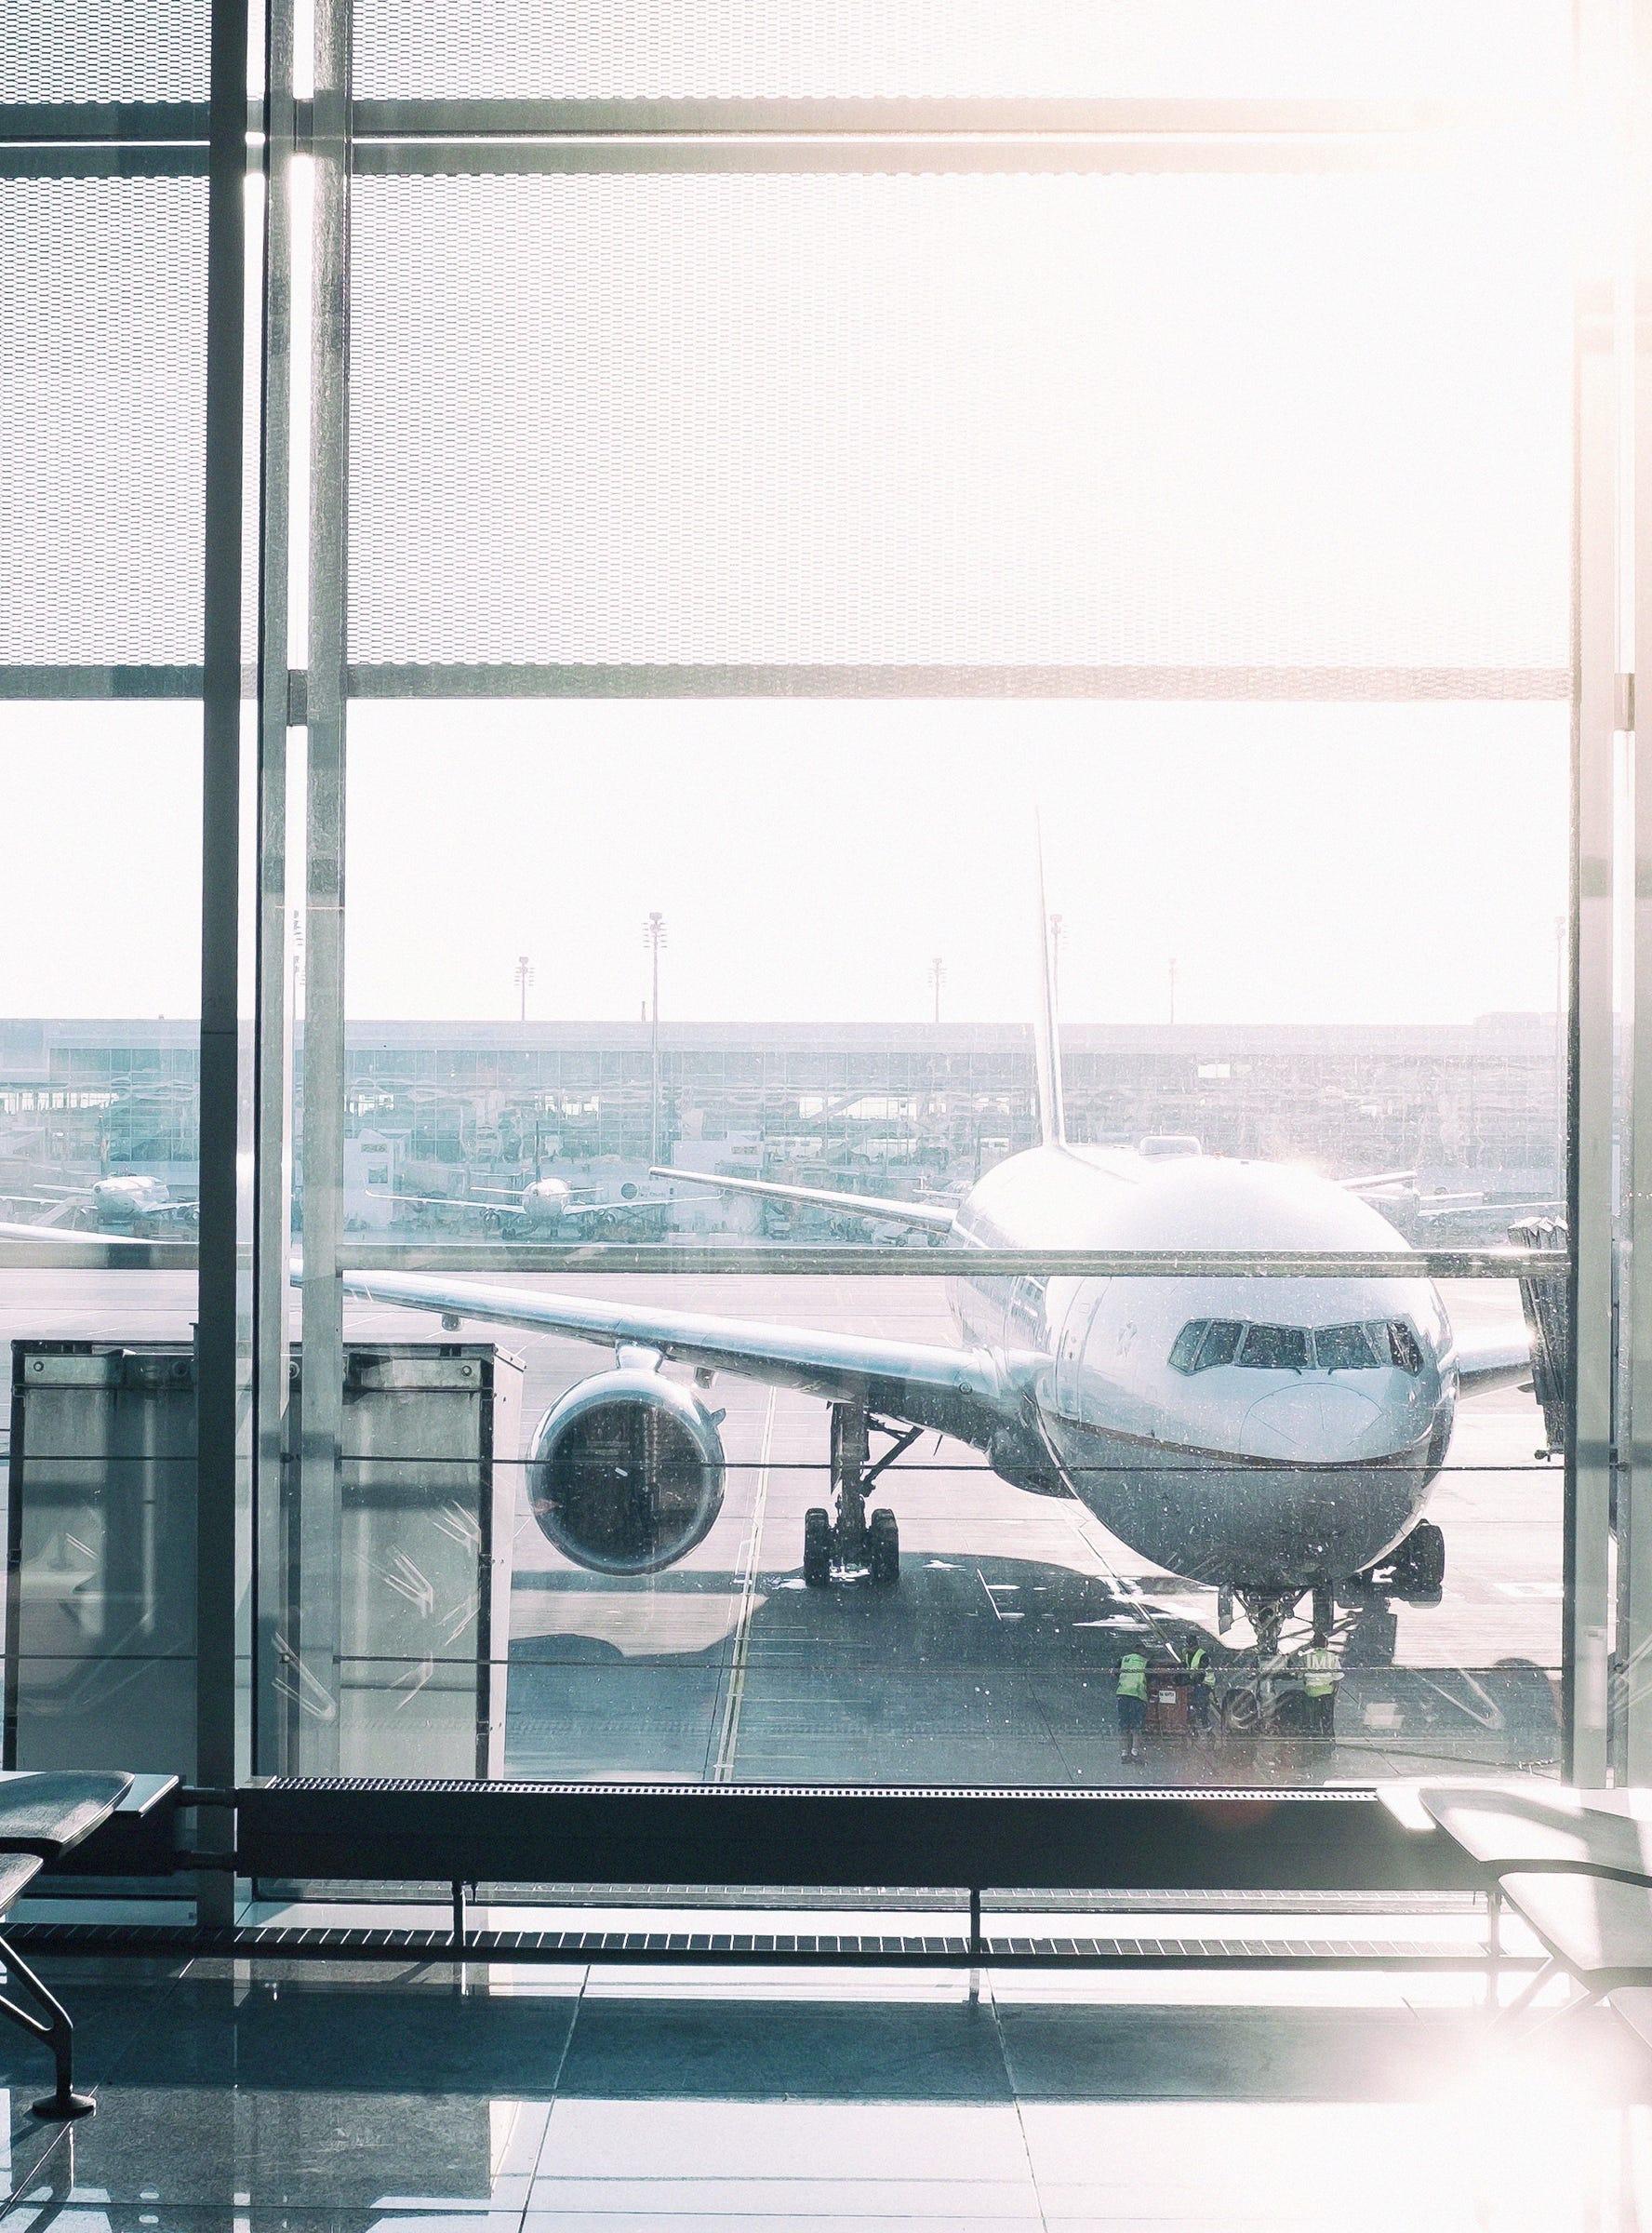 135,000 per trip or plane gourmet hotel 31